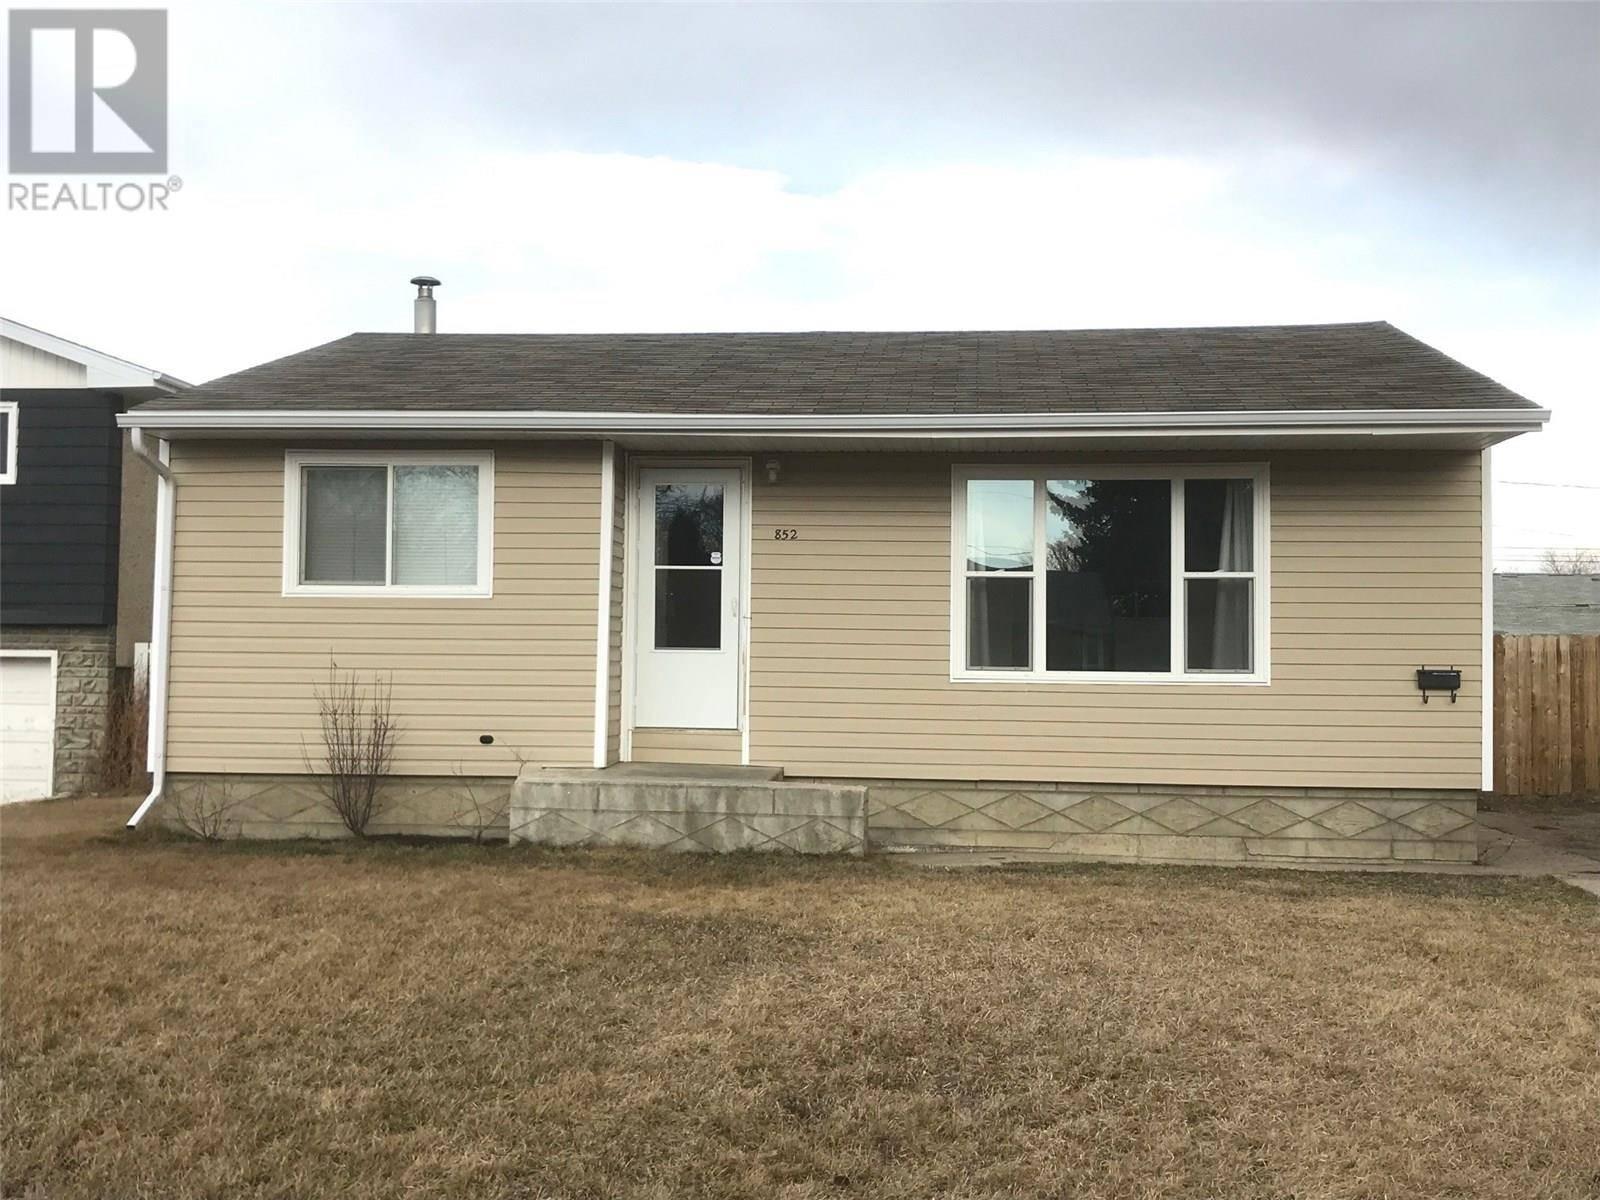 House for sale at 852 112th St North Battleford Saskatchewan - MLS: SK754166